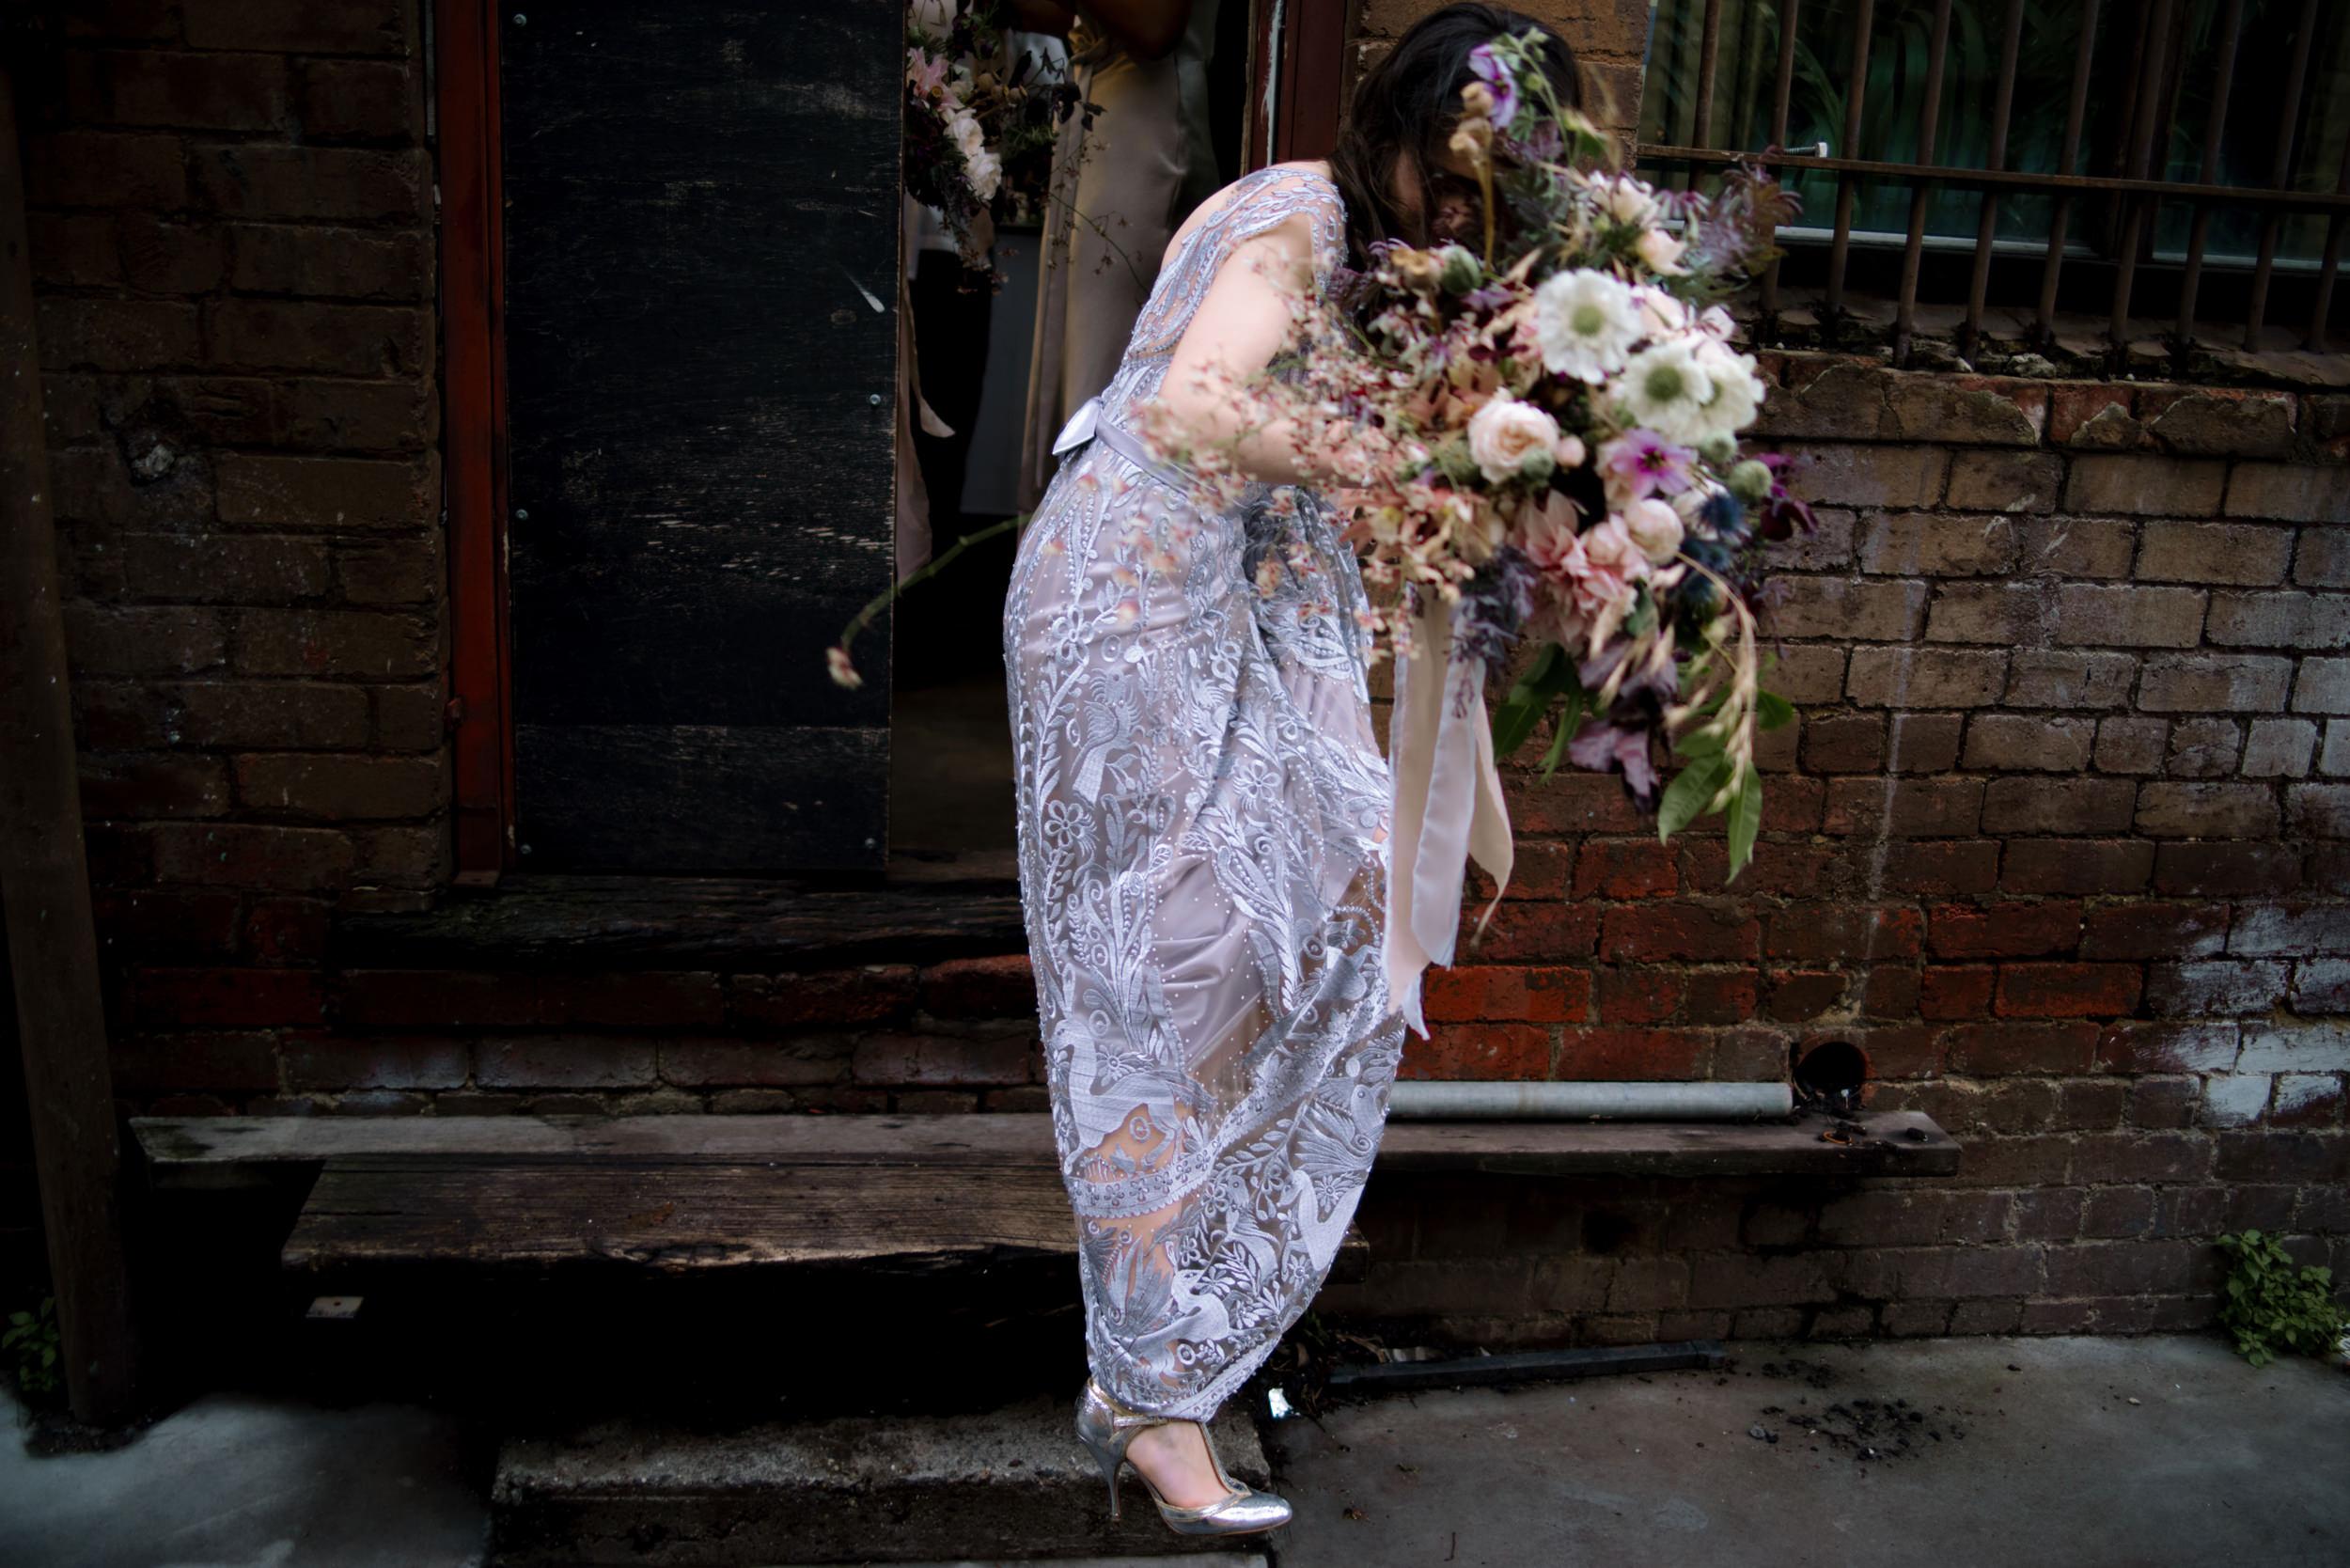 I-Got-You-Babe-&.Co.-Glasshaus-Wedding-Charlotte-Cameron0093.JPG